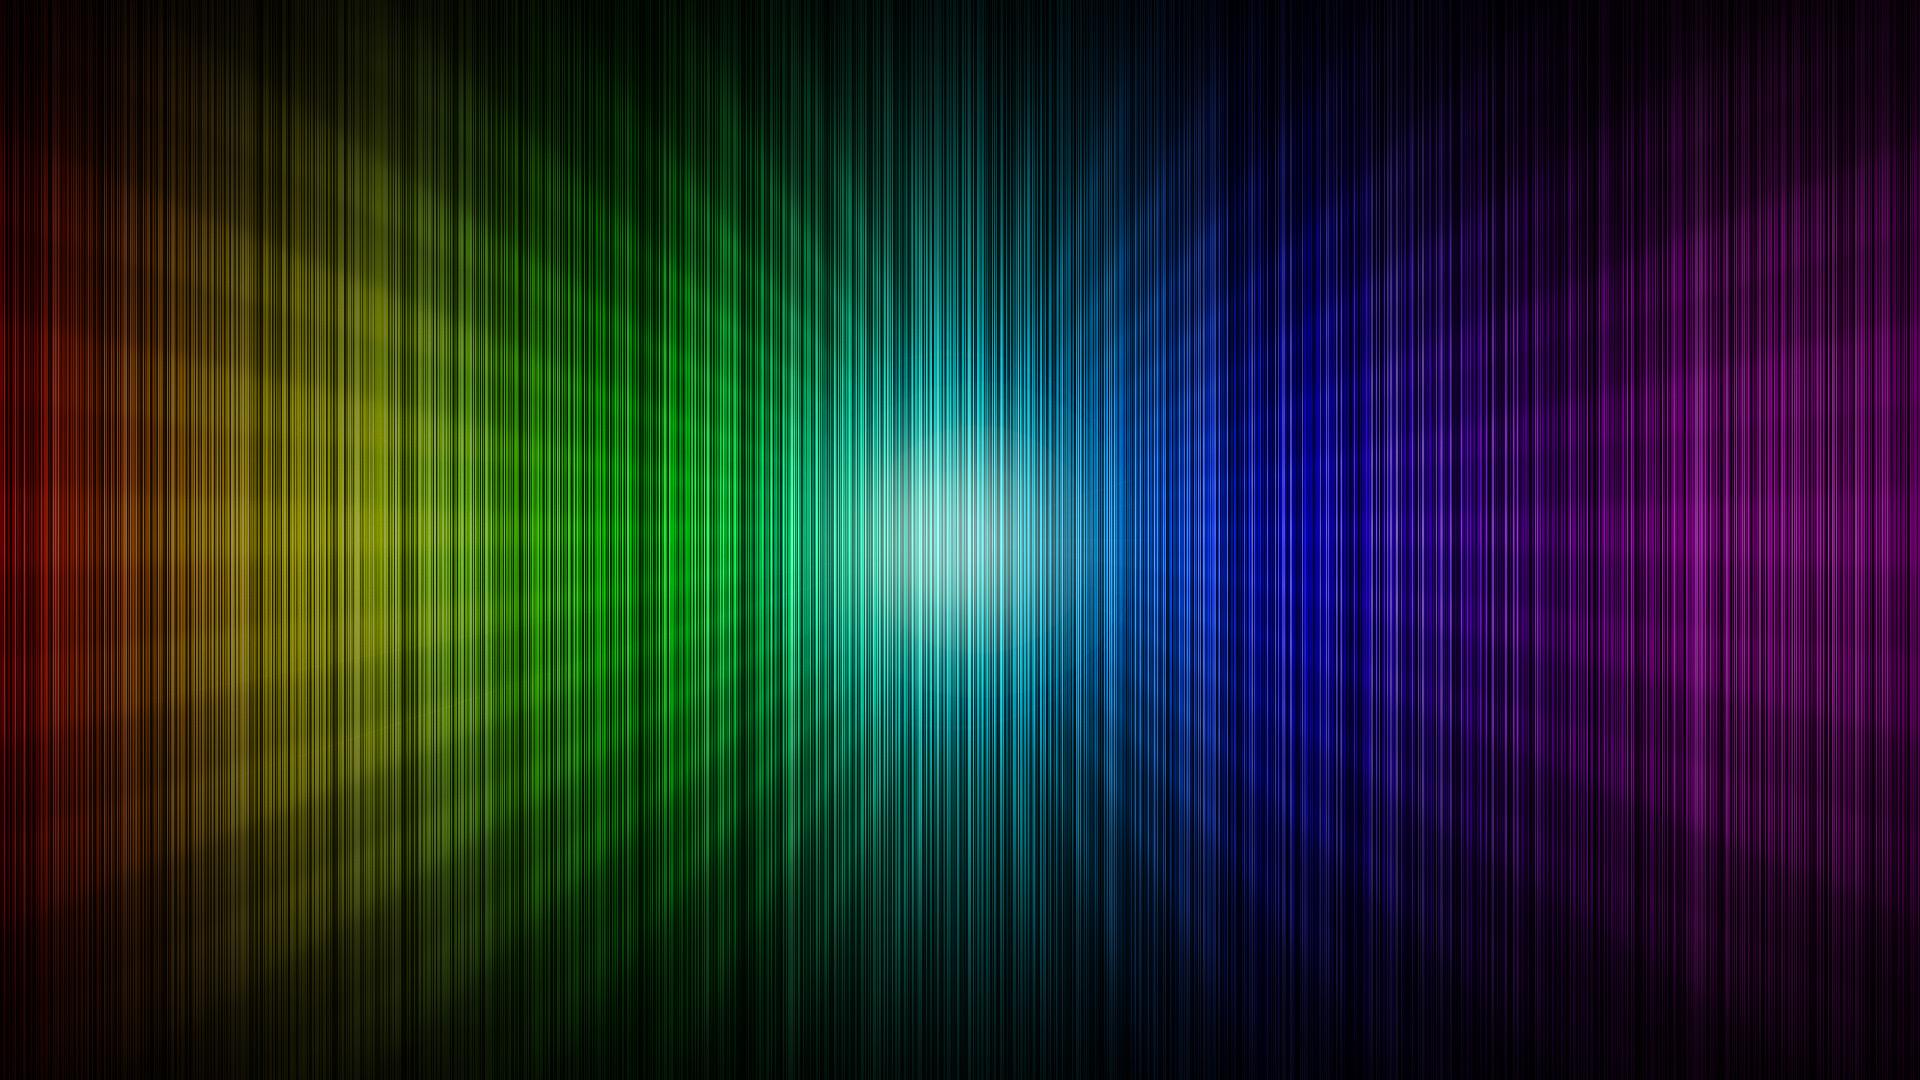 wallpaper, hires, rainbow, custom, creating, tutorialdesk, tutorial, final